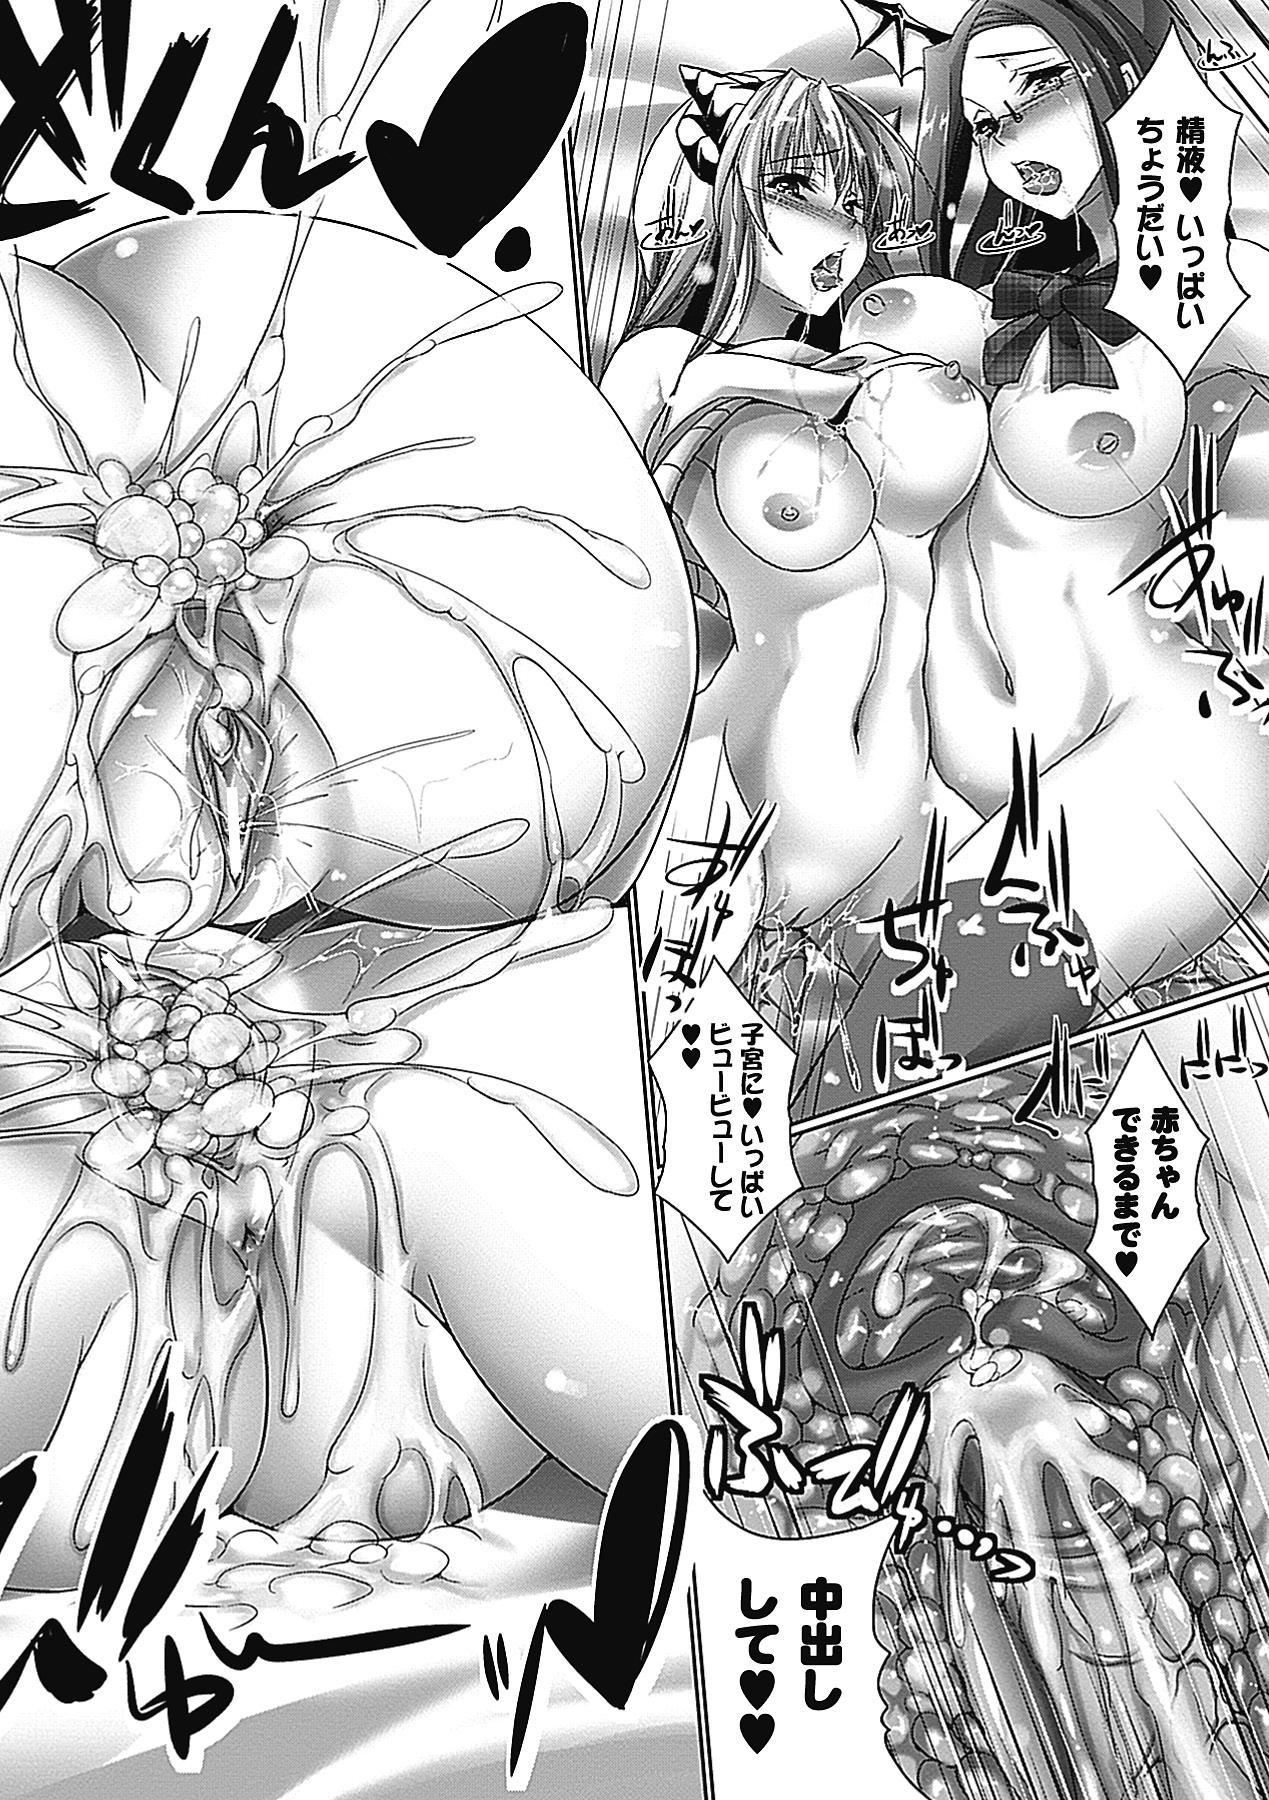 Amai Kuchibiru Torokeru Kuchibiru 37